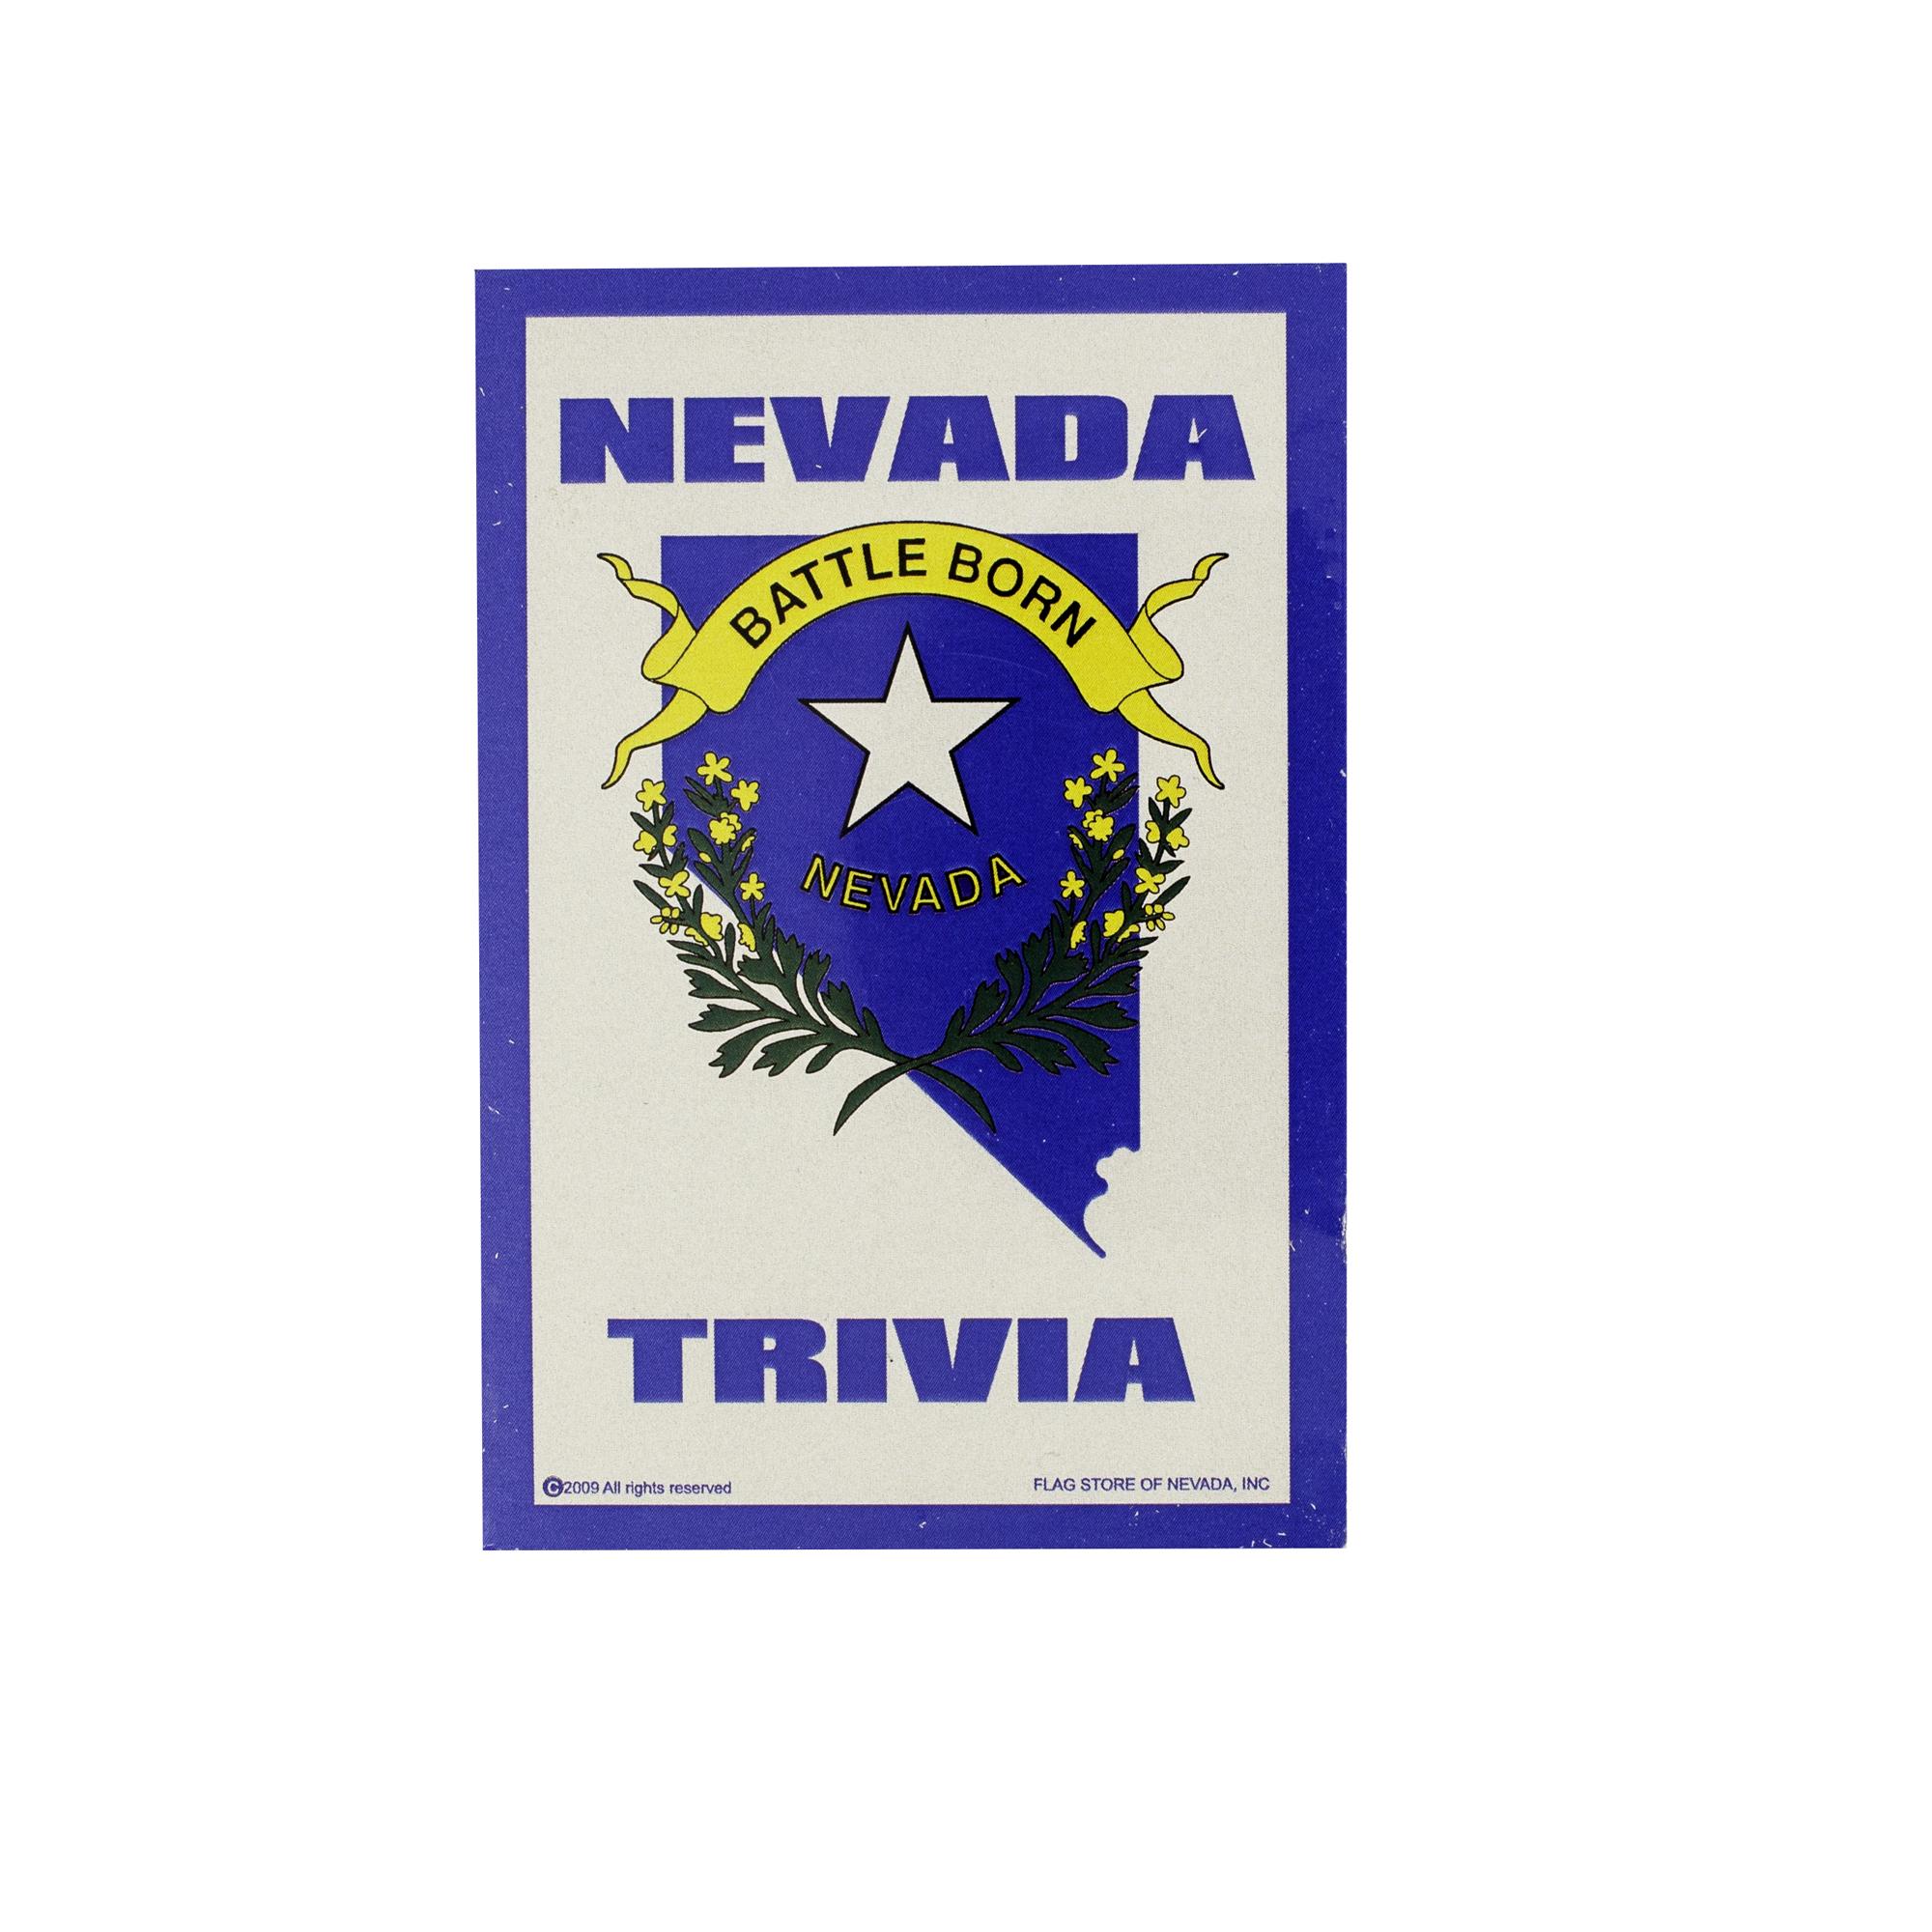 Nevada Trivia - 500 Extra Trivia Questions - Battleborn Edition